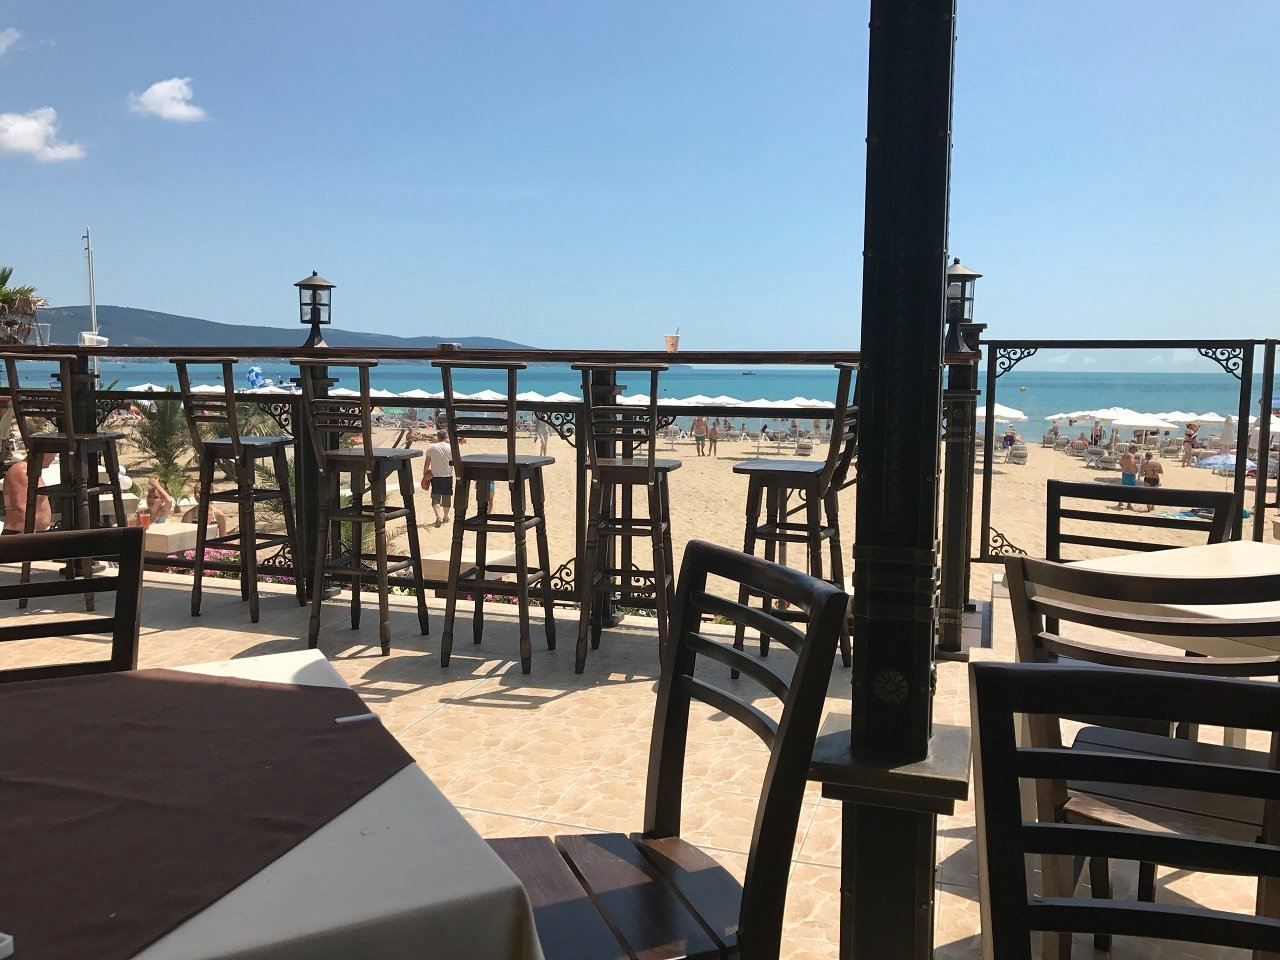 Hotel Golden Ina - Rumba Beach - 13 Popup navigation